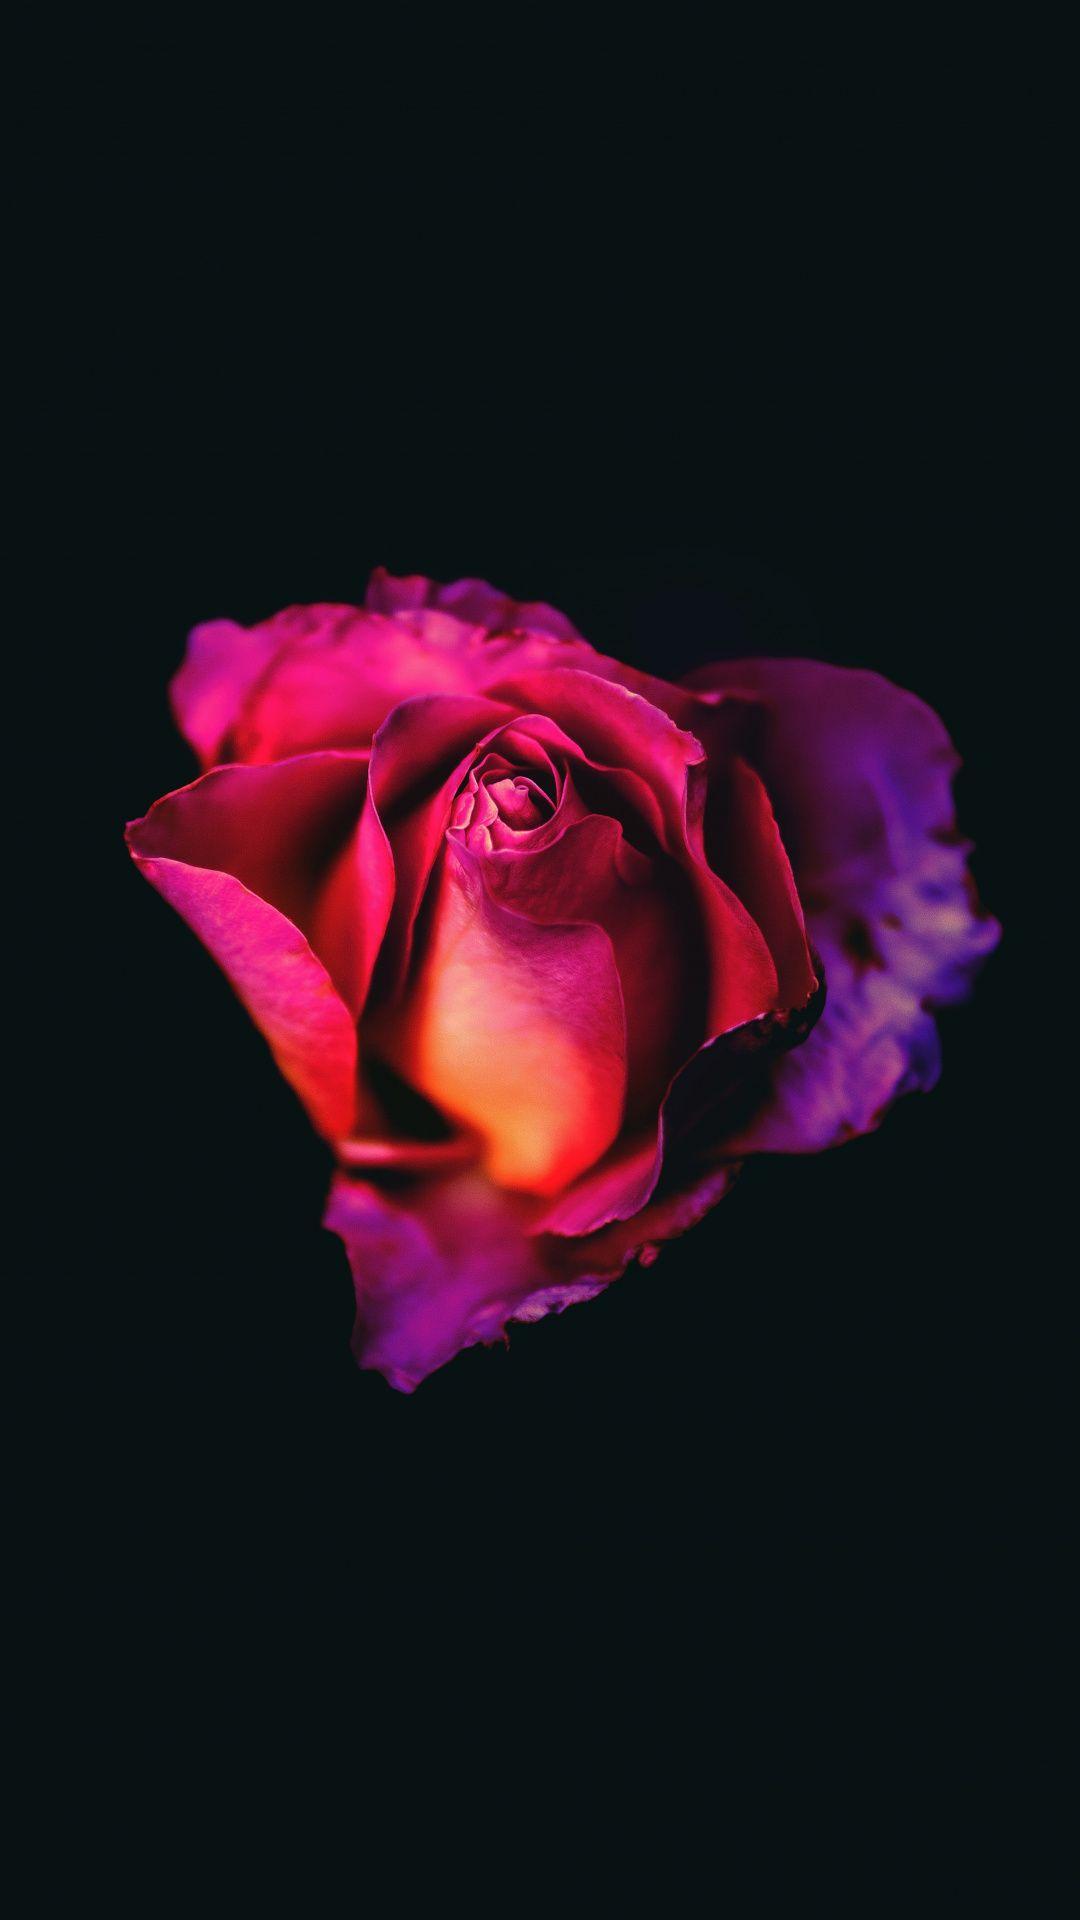 Rose Bud Pink Flower Dark Portrait 1080x1920 Wallpaper Rose Wallpaper Red Roses Wallpaper Wallpaper Iphone Roses